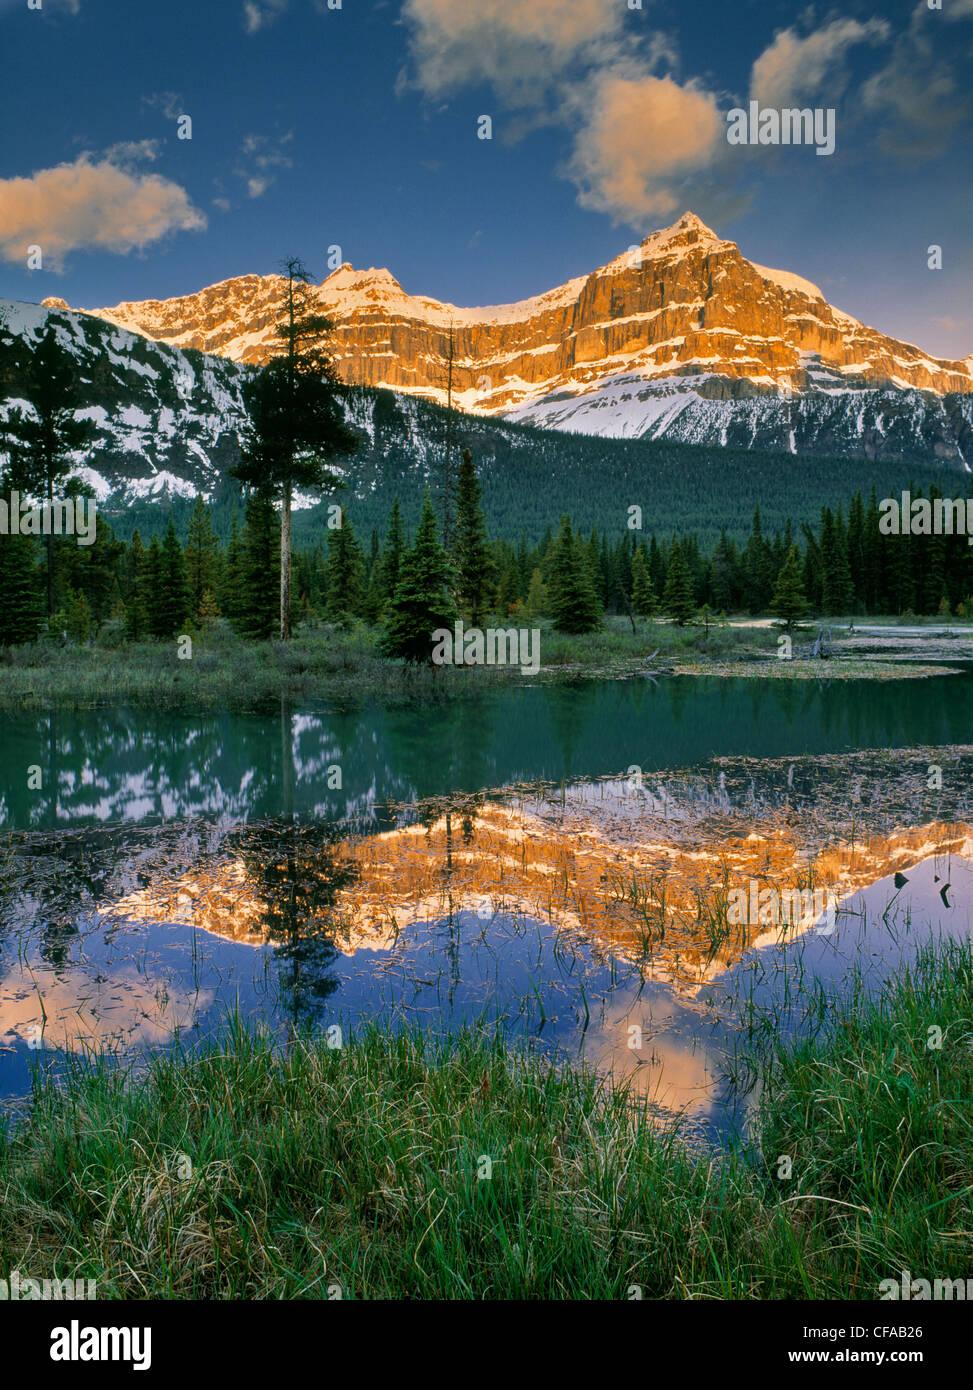 Mount Epaulette and Mistaya River, Banff National Park, Alberta, Canada. - Stock Image